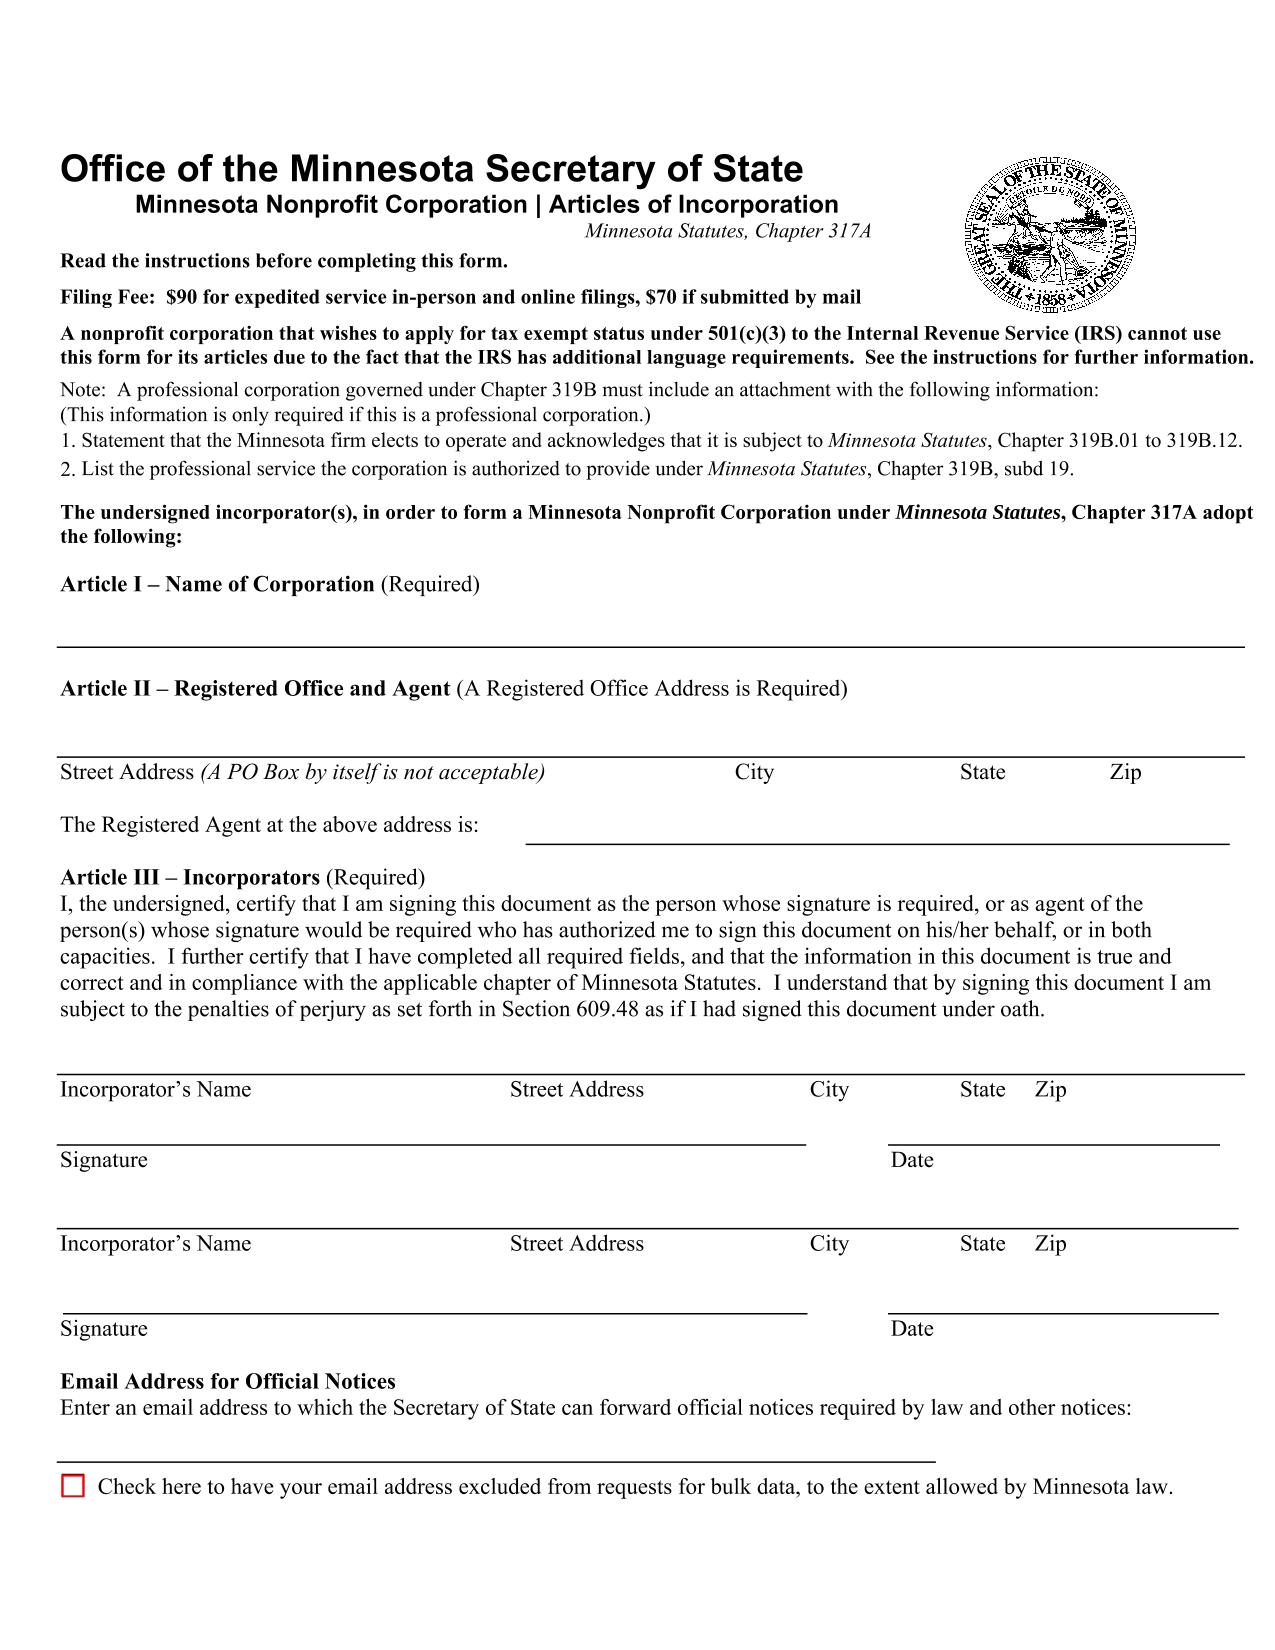 Minnesota Nonprofit Corporation Articles of Incorporation